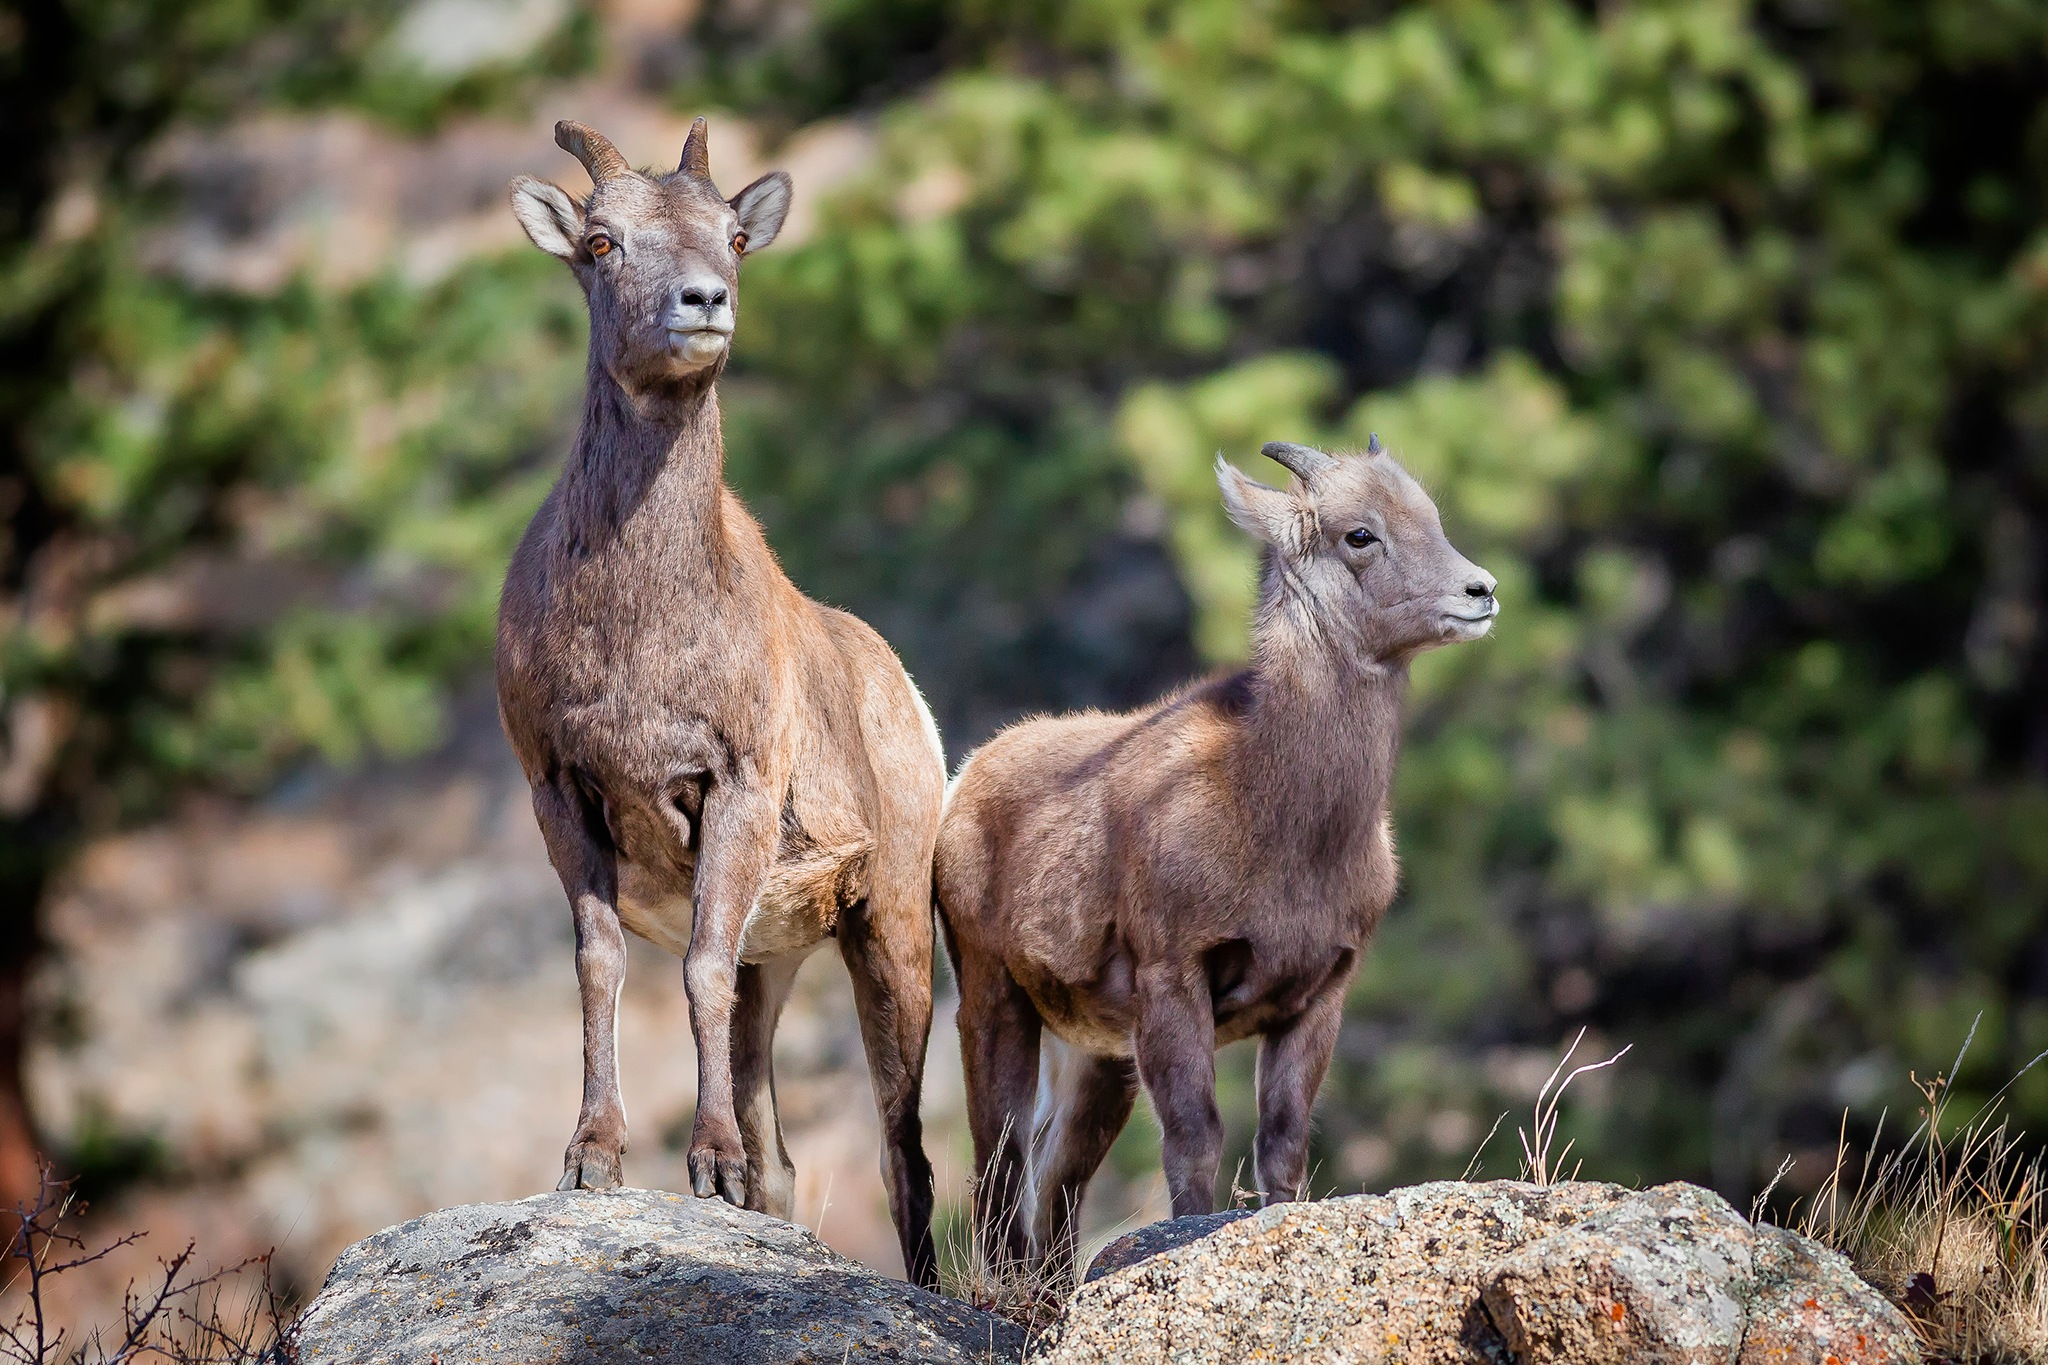 Bighorn Ewe and Yearling Lamb by Richard Hahn